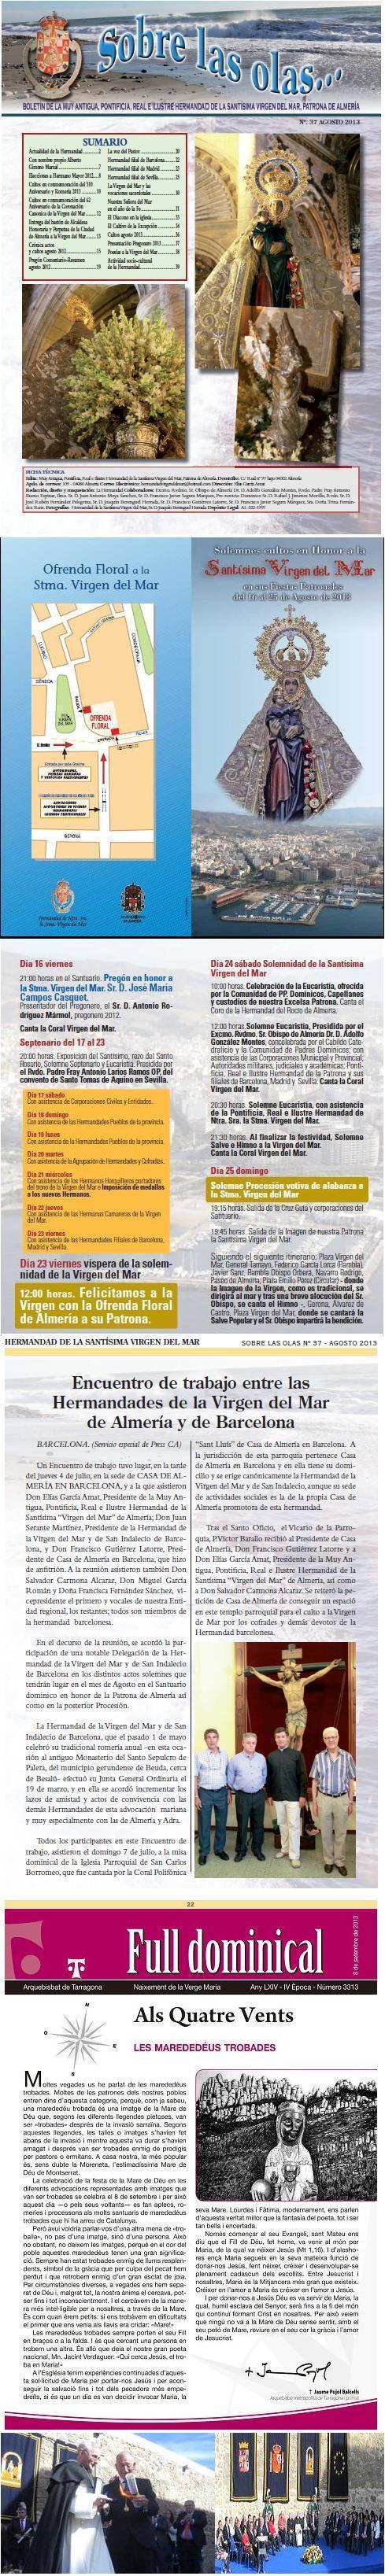 20131117192310-dipticos-vm-dia-provincia-2013.jpg